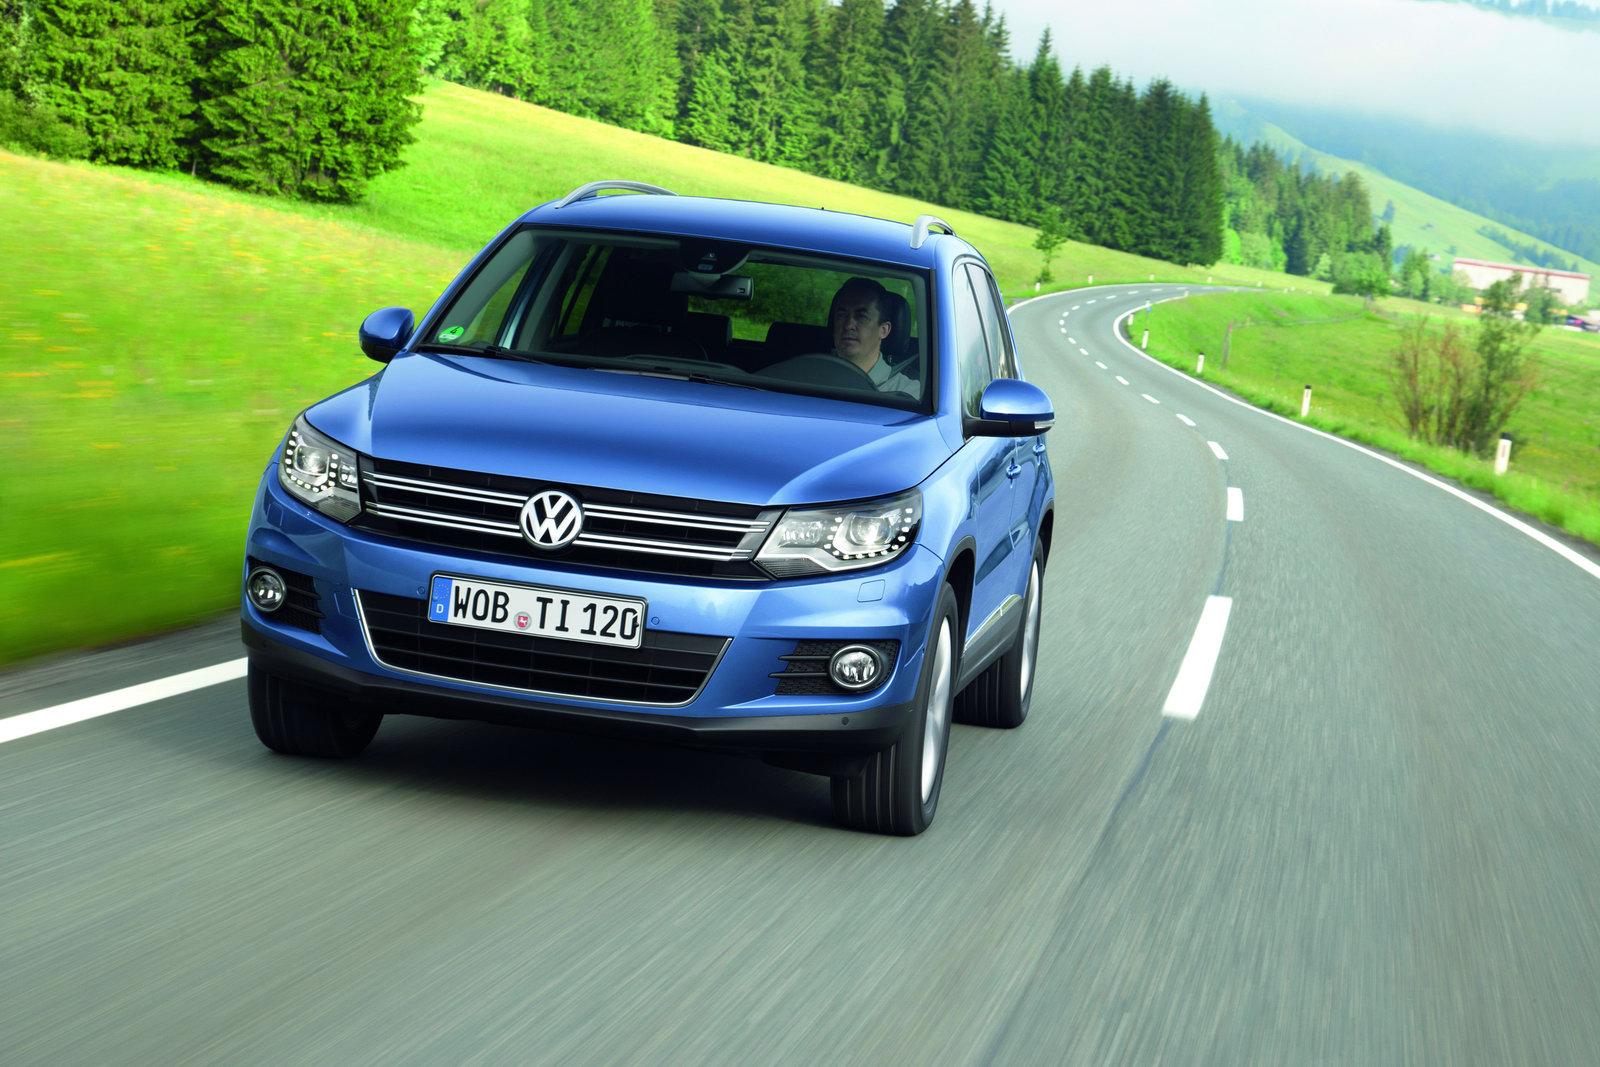 2015 volkswagen tiguan could gain three door coupe hybrid. Black Bedroom Furniture Sets. Home Design Ideas